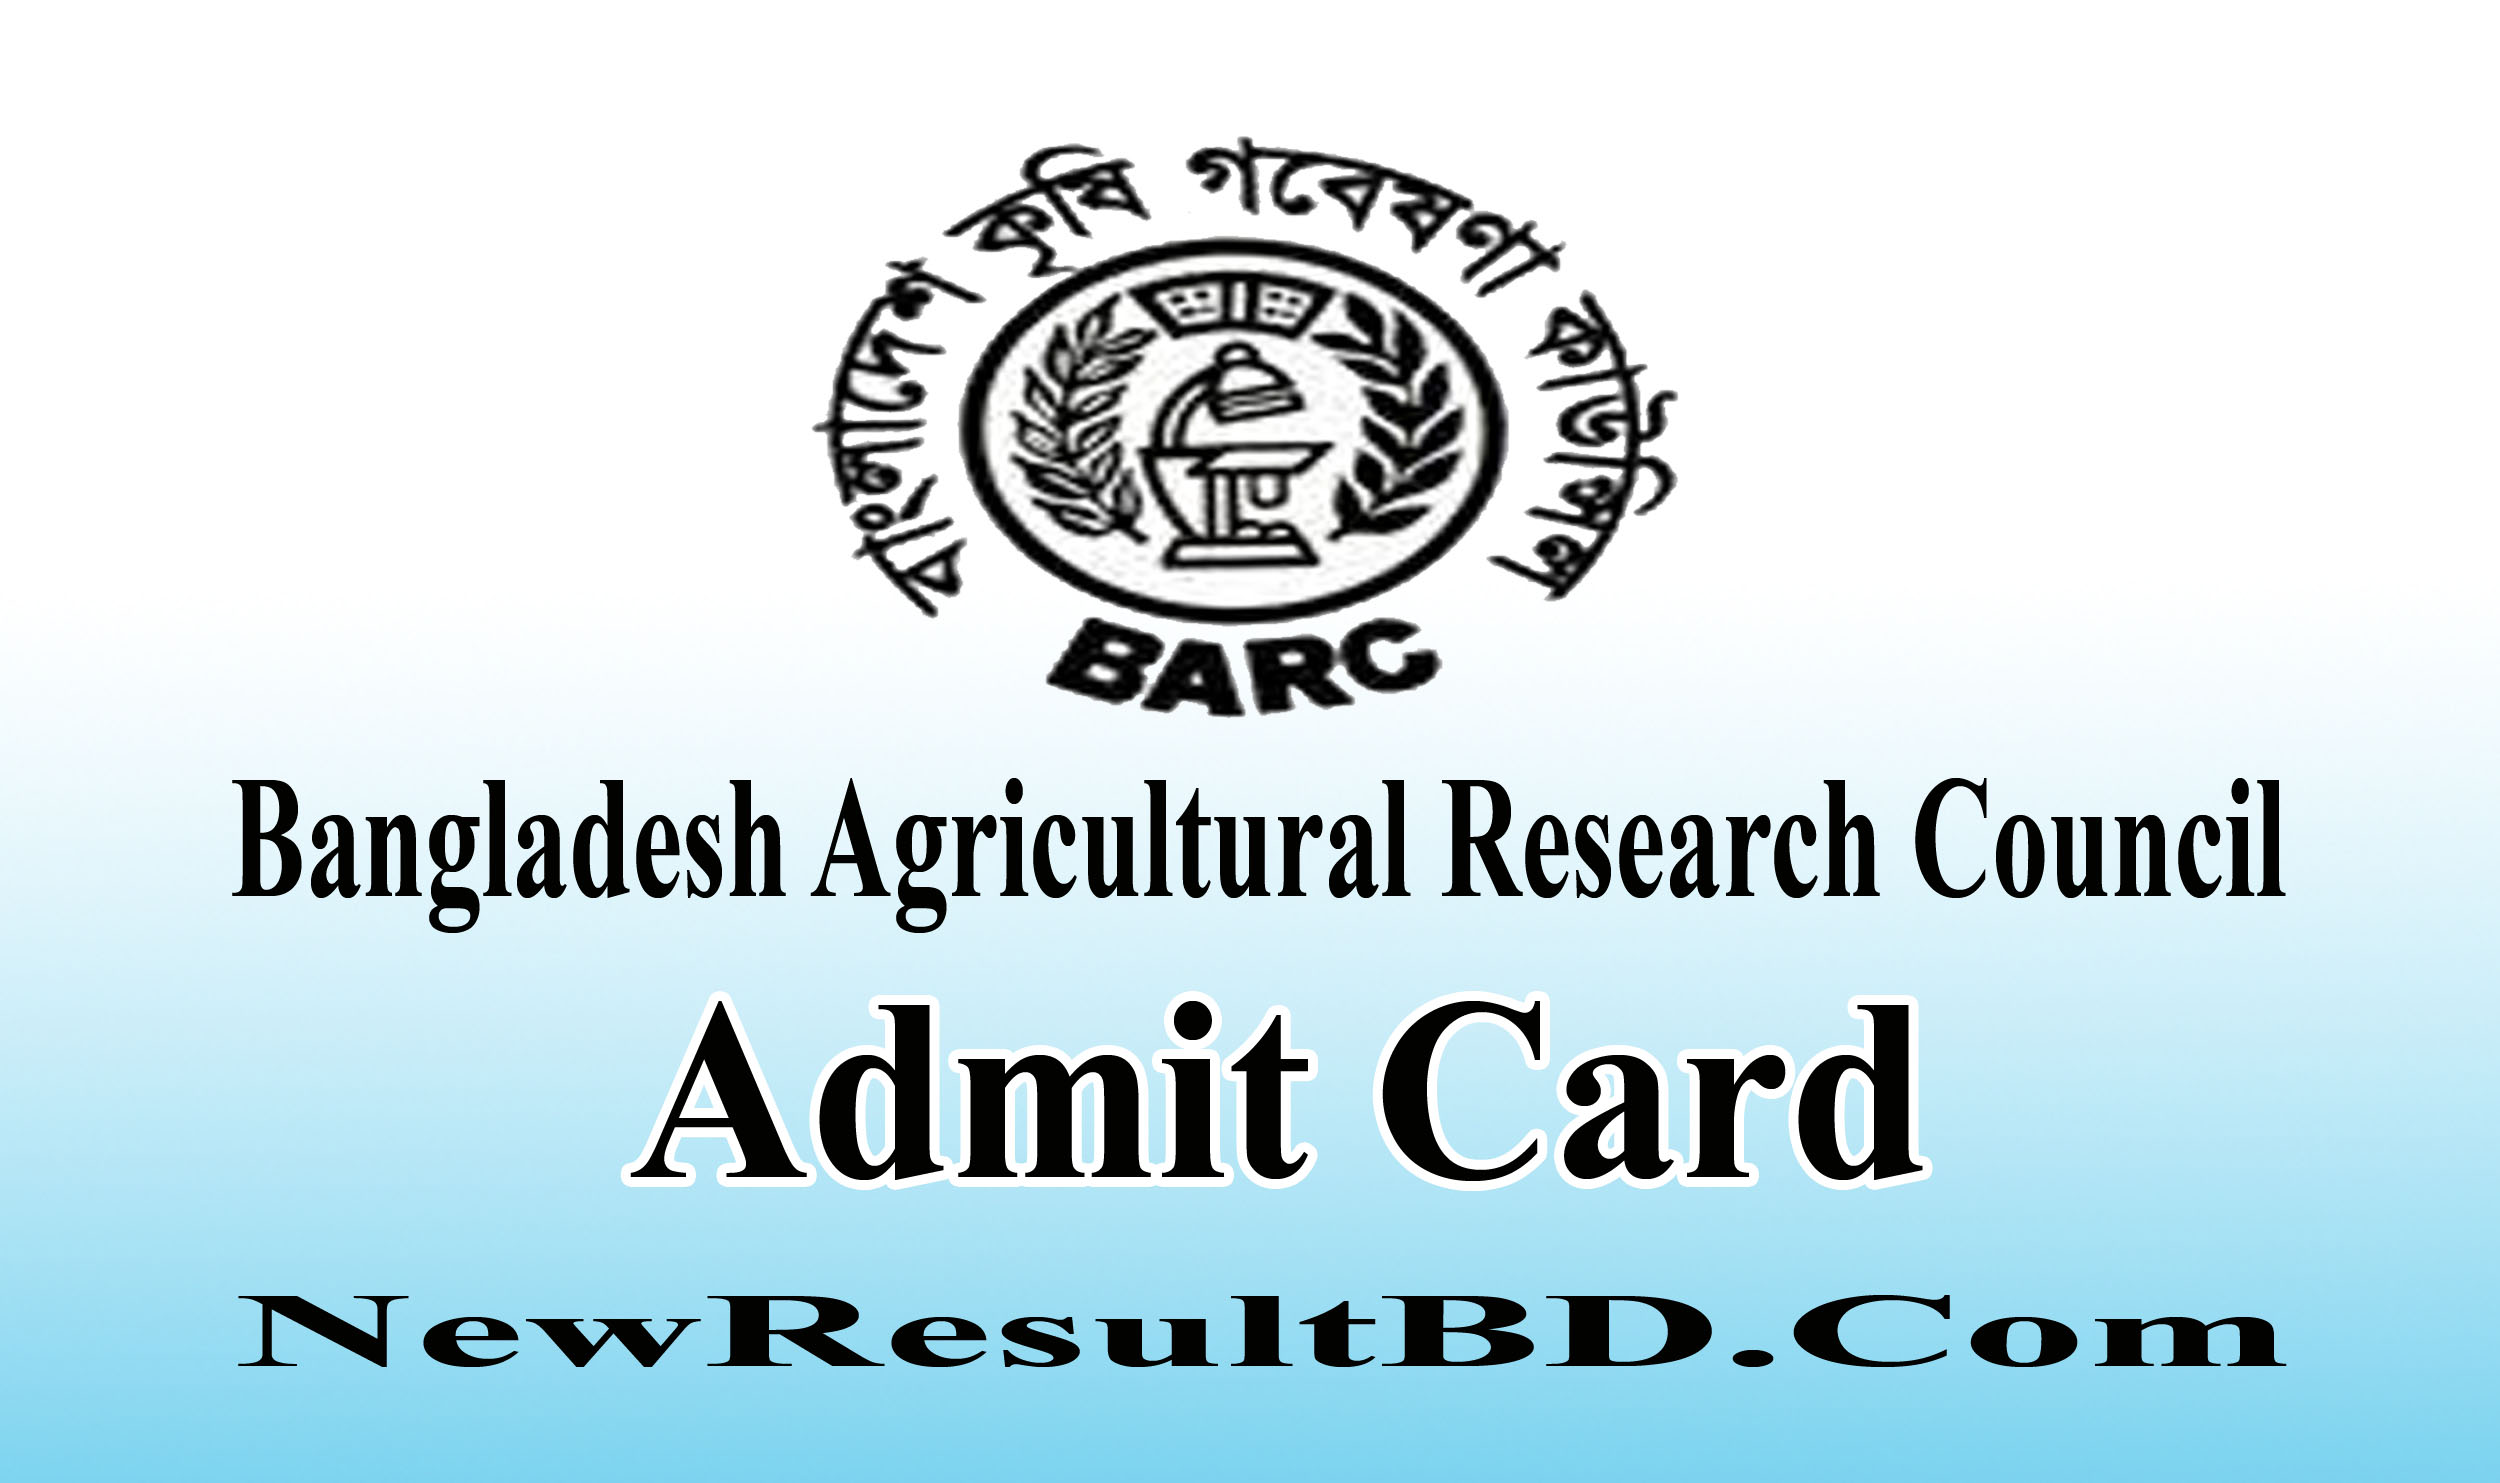 BARC Admit Card 2020